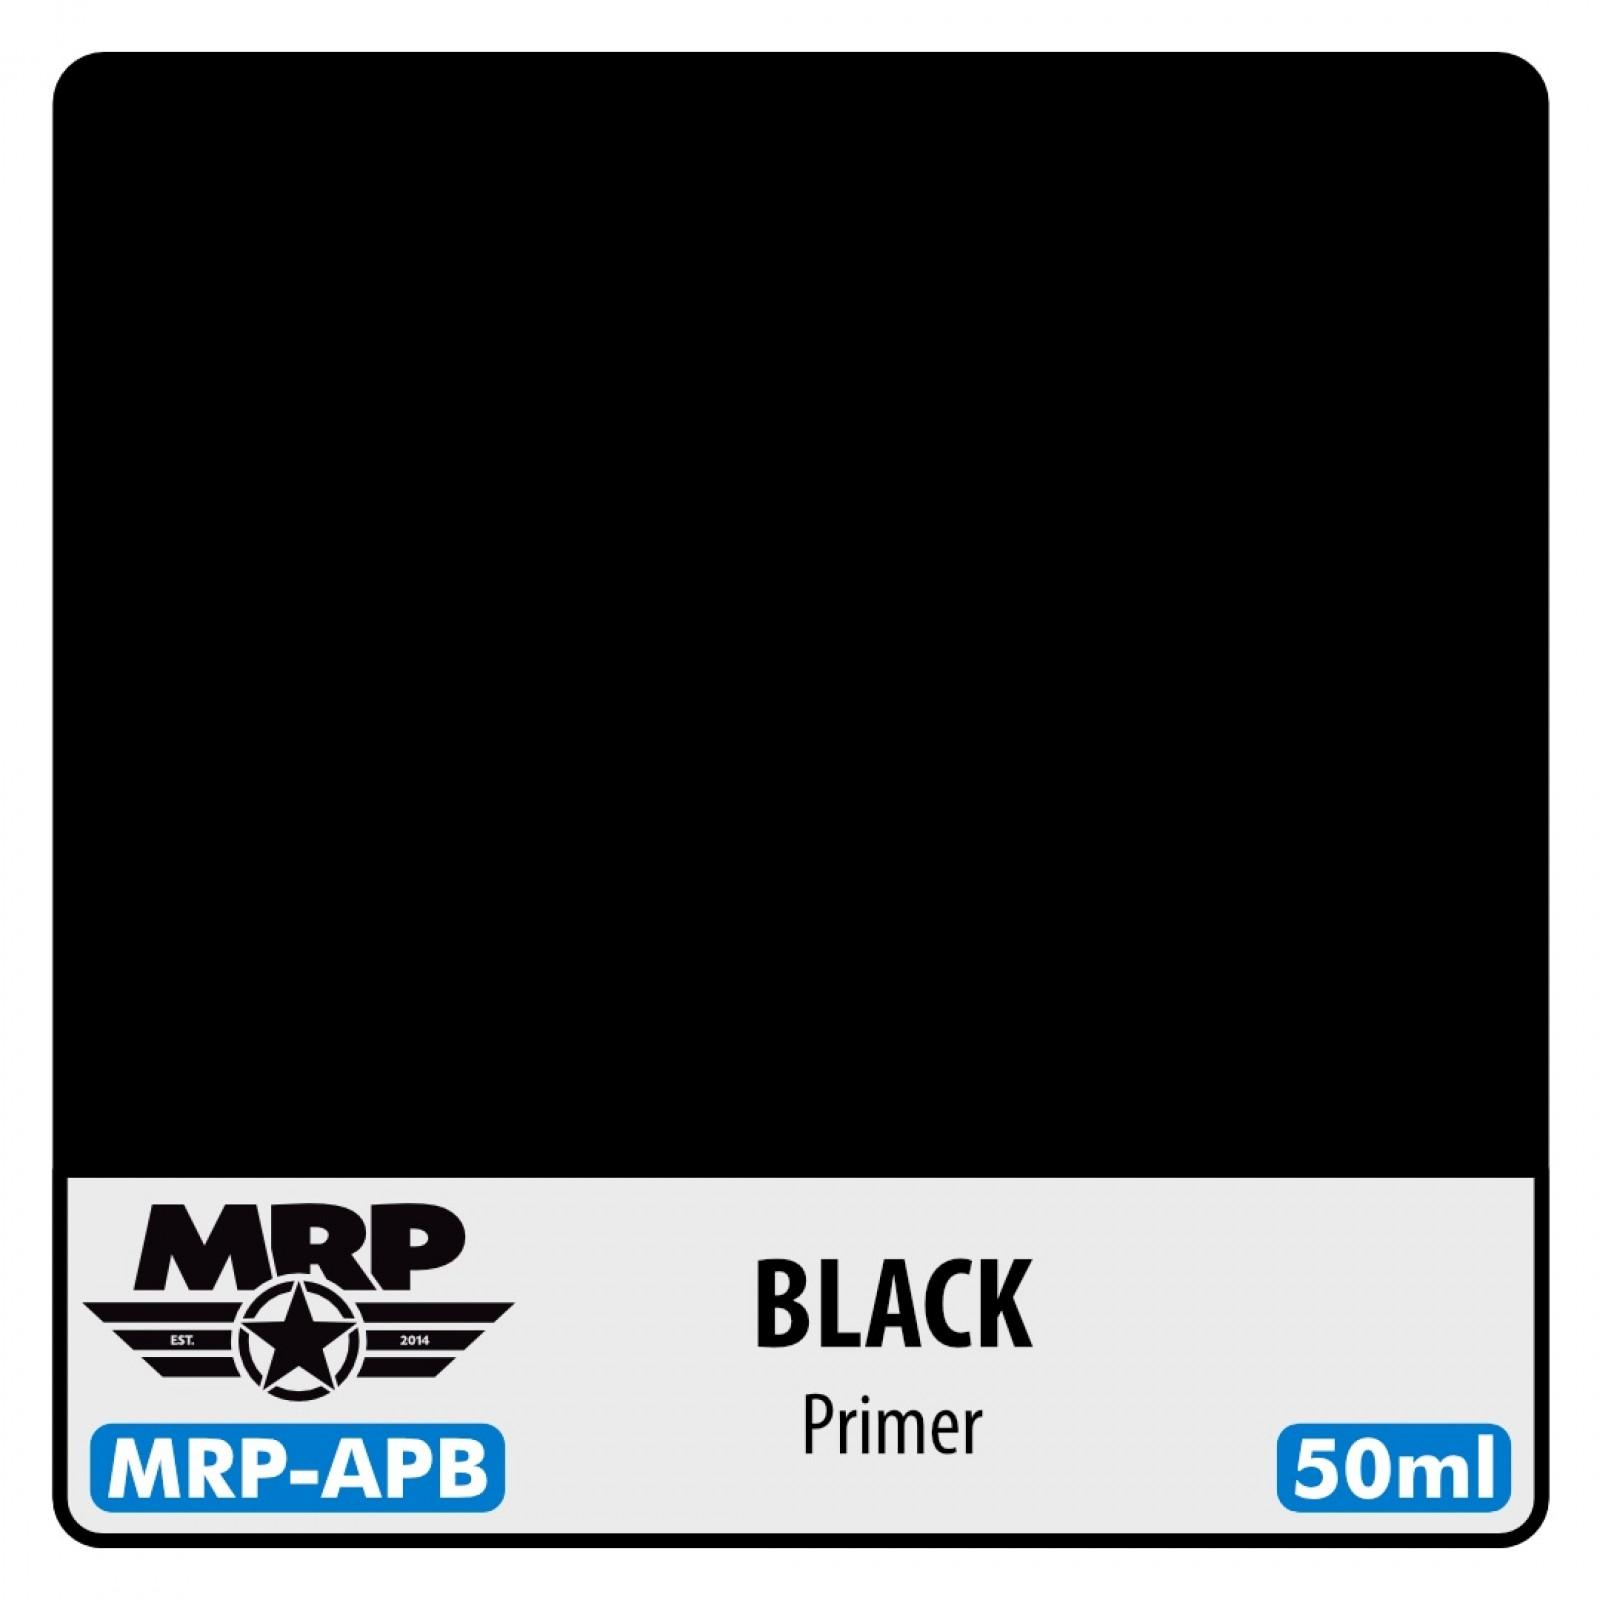 MRP-APB Primer BLACK